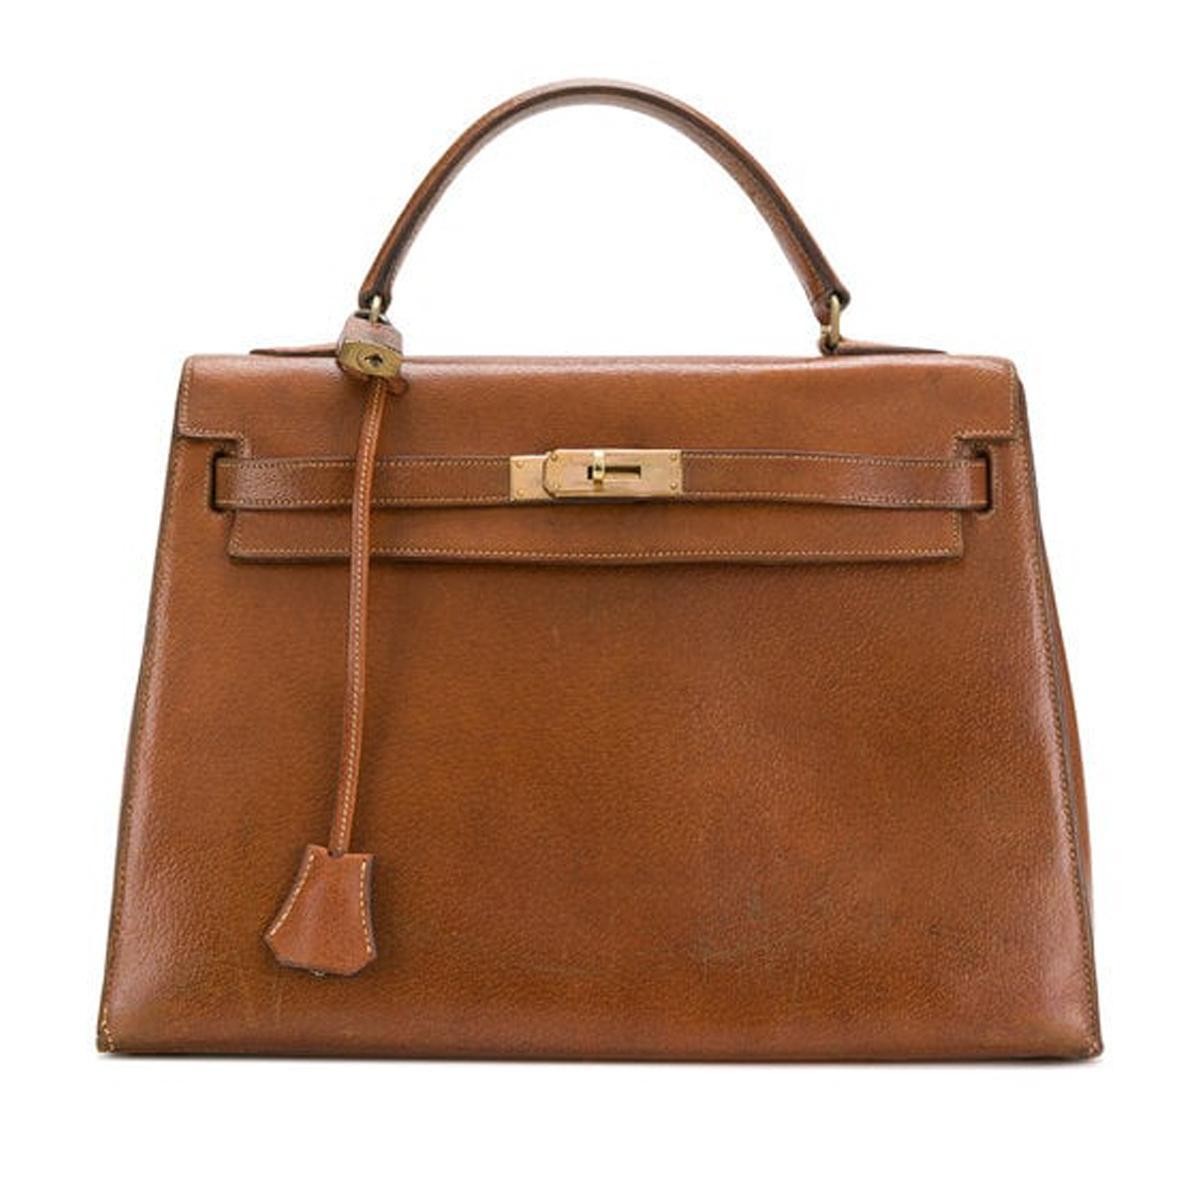 classic-designer-handbag-brands-271996-1541601310857-product.1200x0c.jpg (1200×1200)